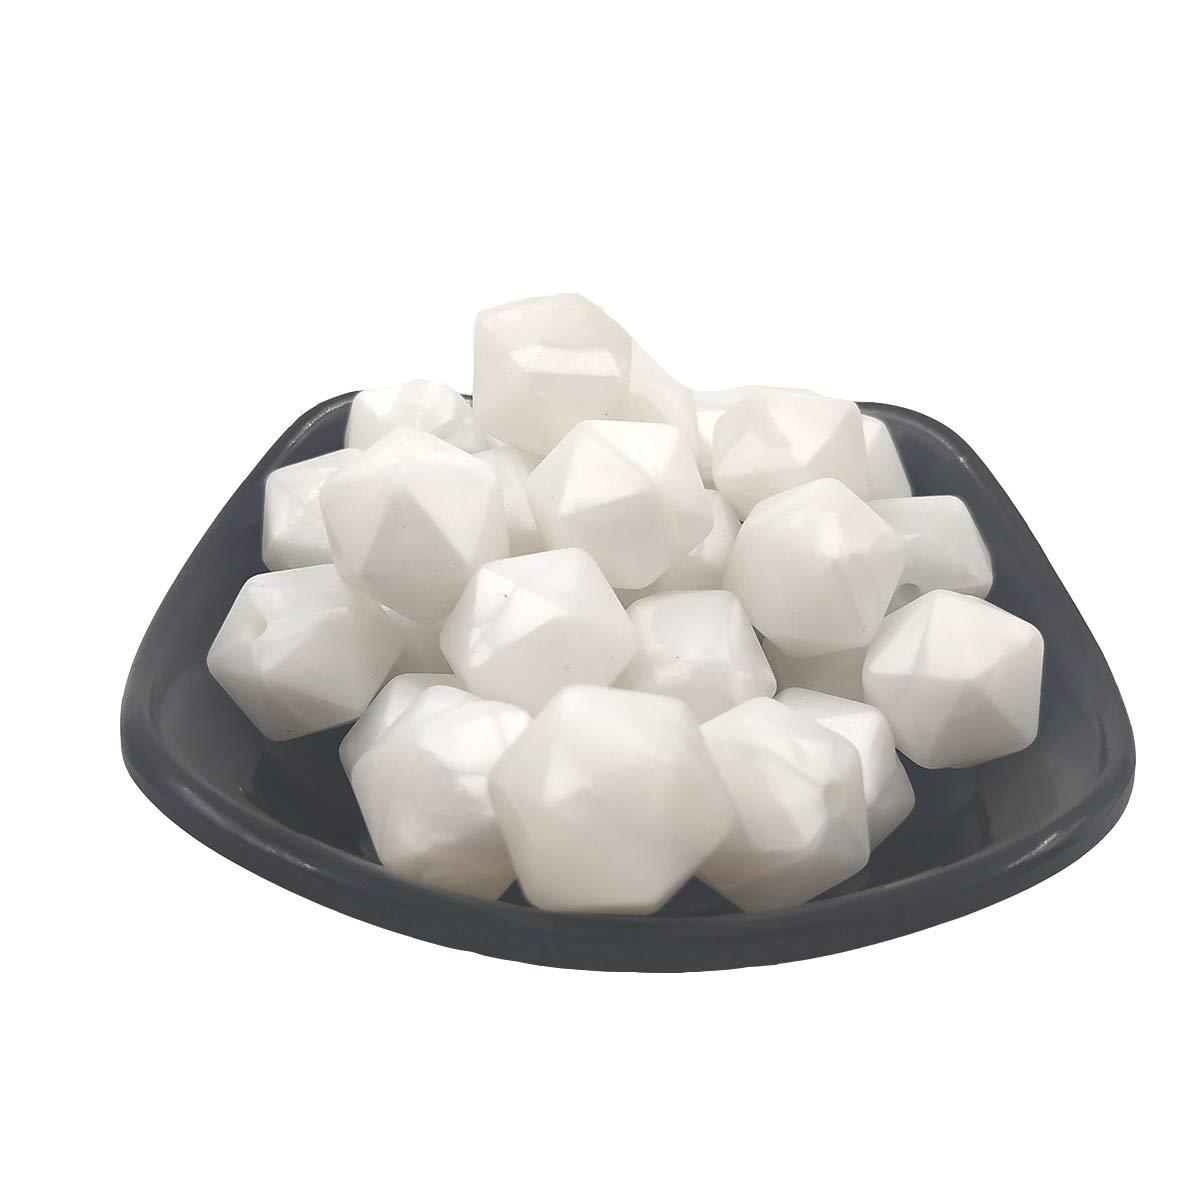 30pcs 17mm Silicone Polygon Pearl Beads Silicone Geometric Icosahedron Shape Beads Necklace Bangle DIY Beading Accessory (Pearl White)